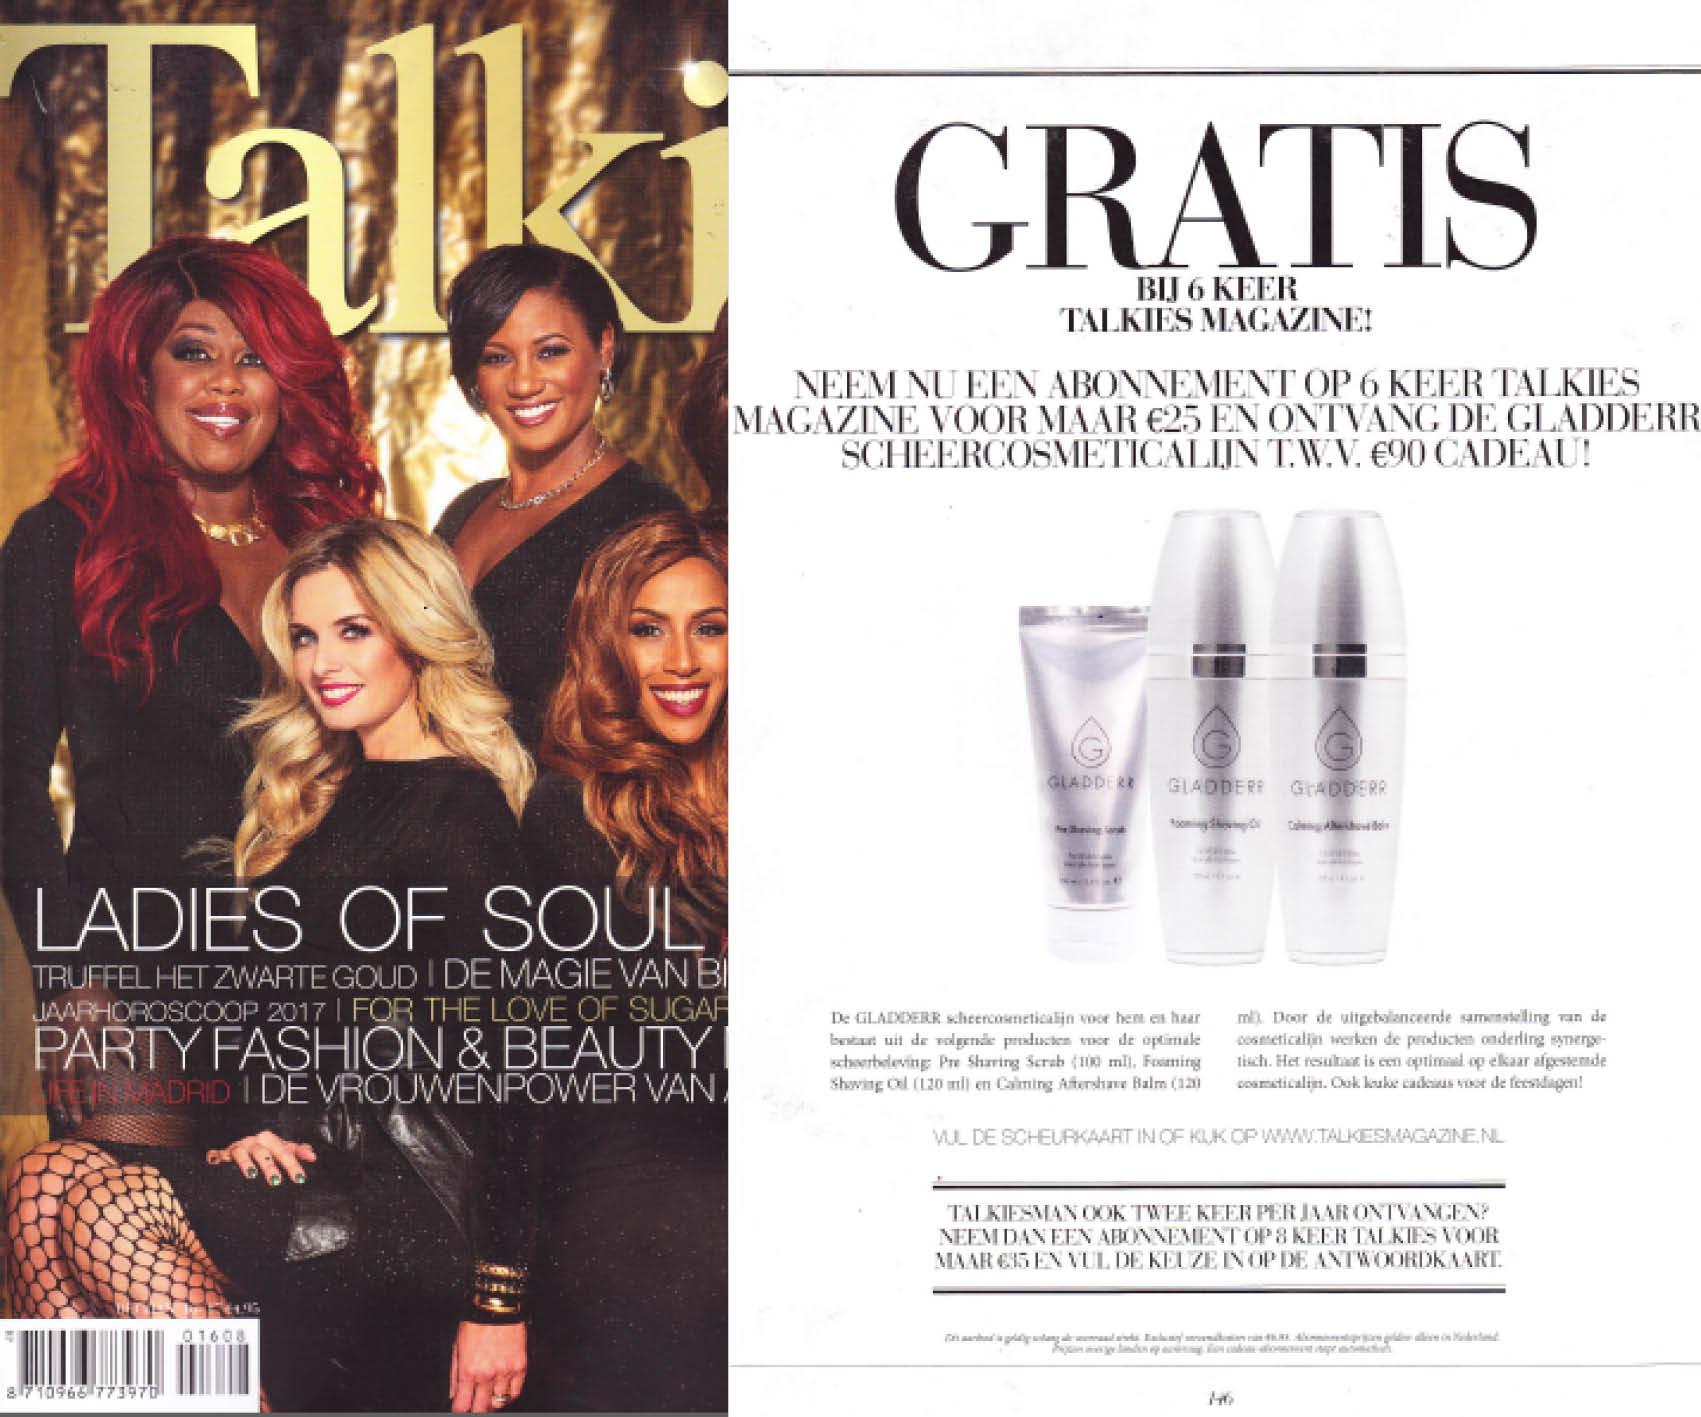 Talkies magazine: GLADDERR cadeau